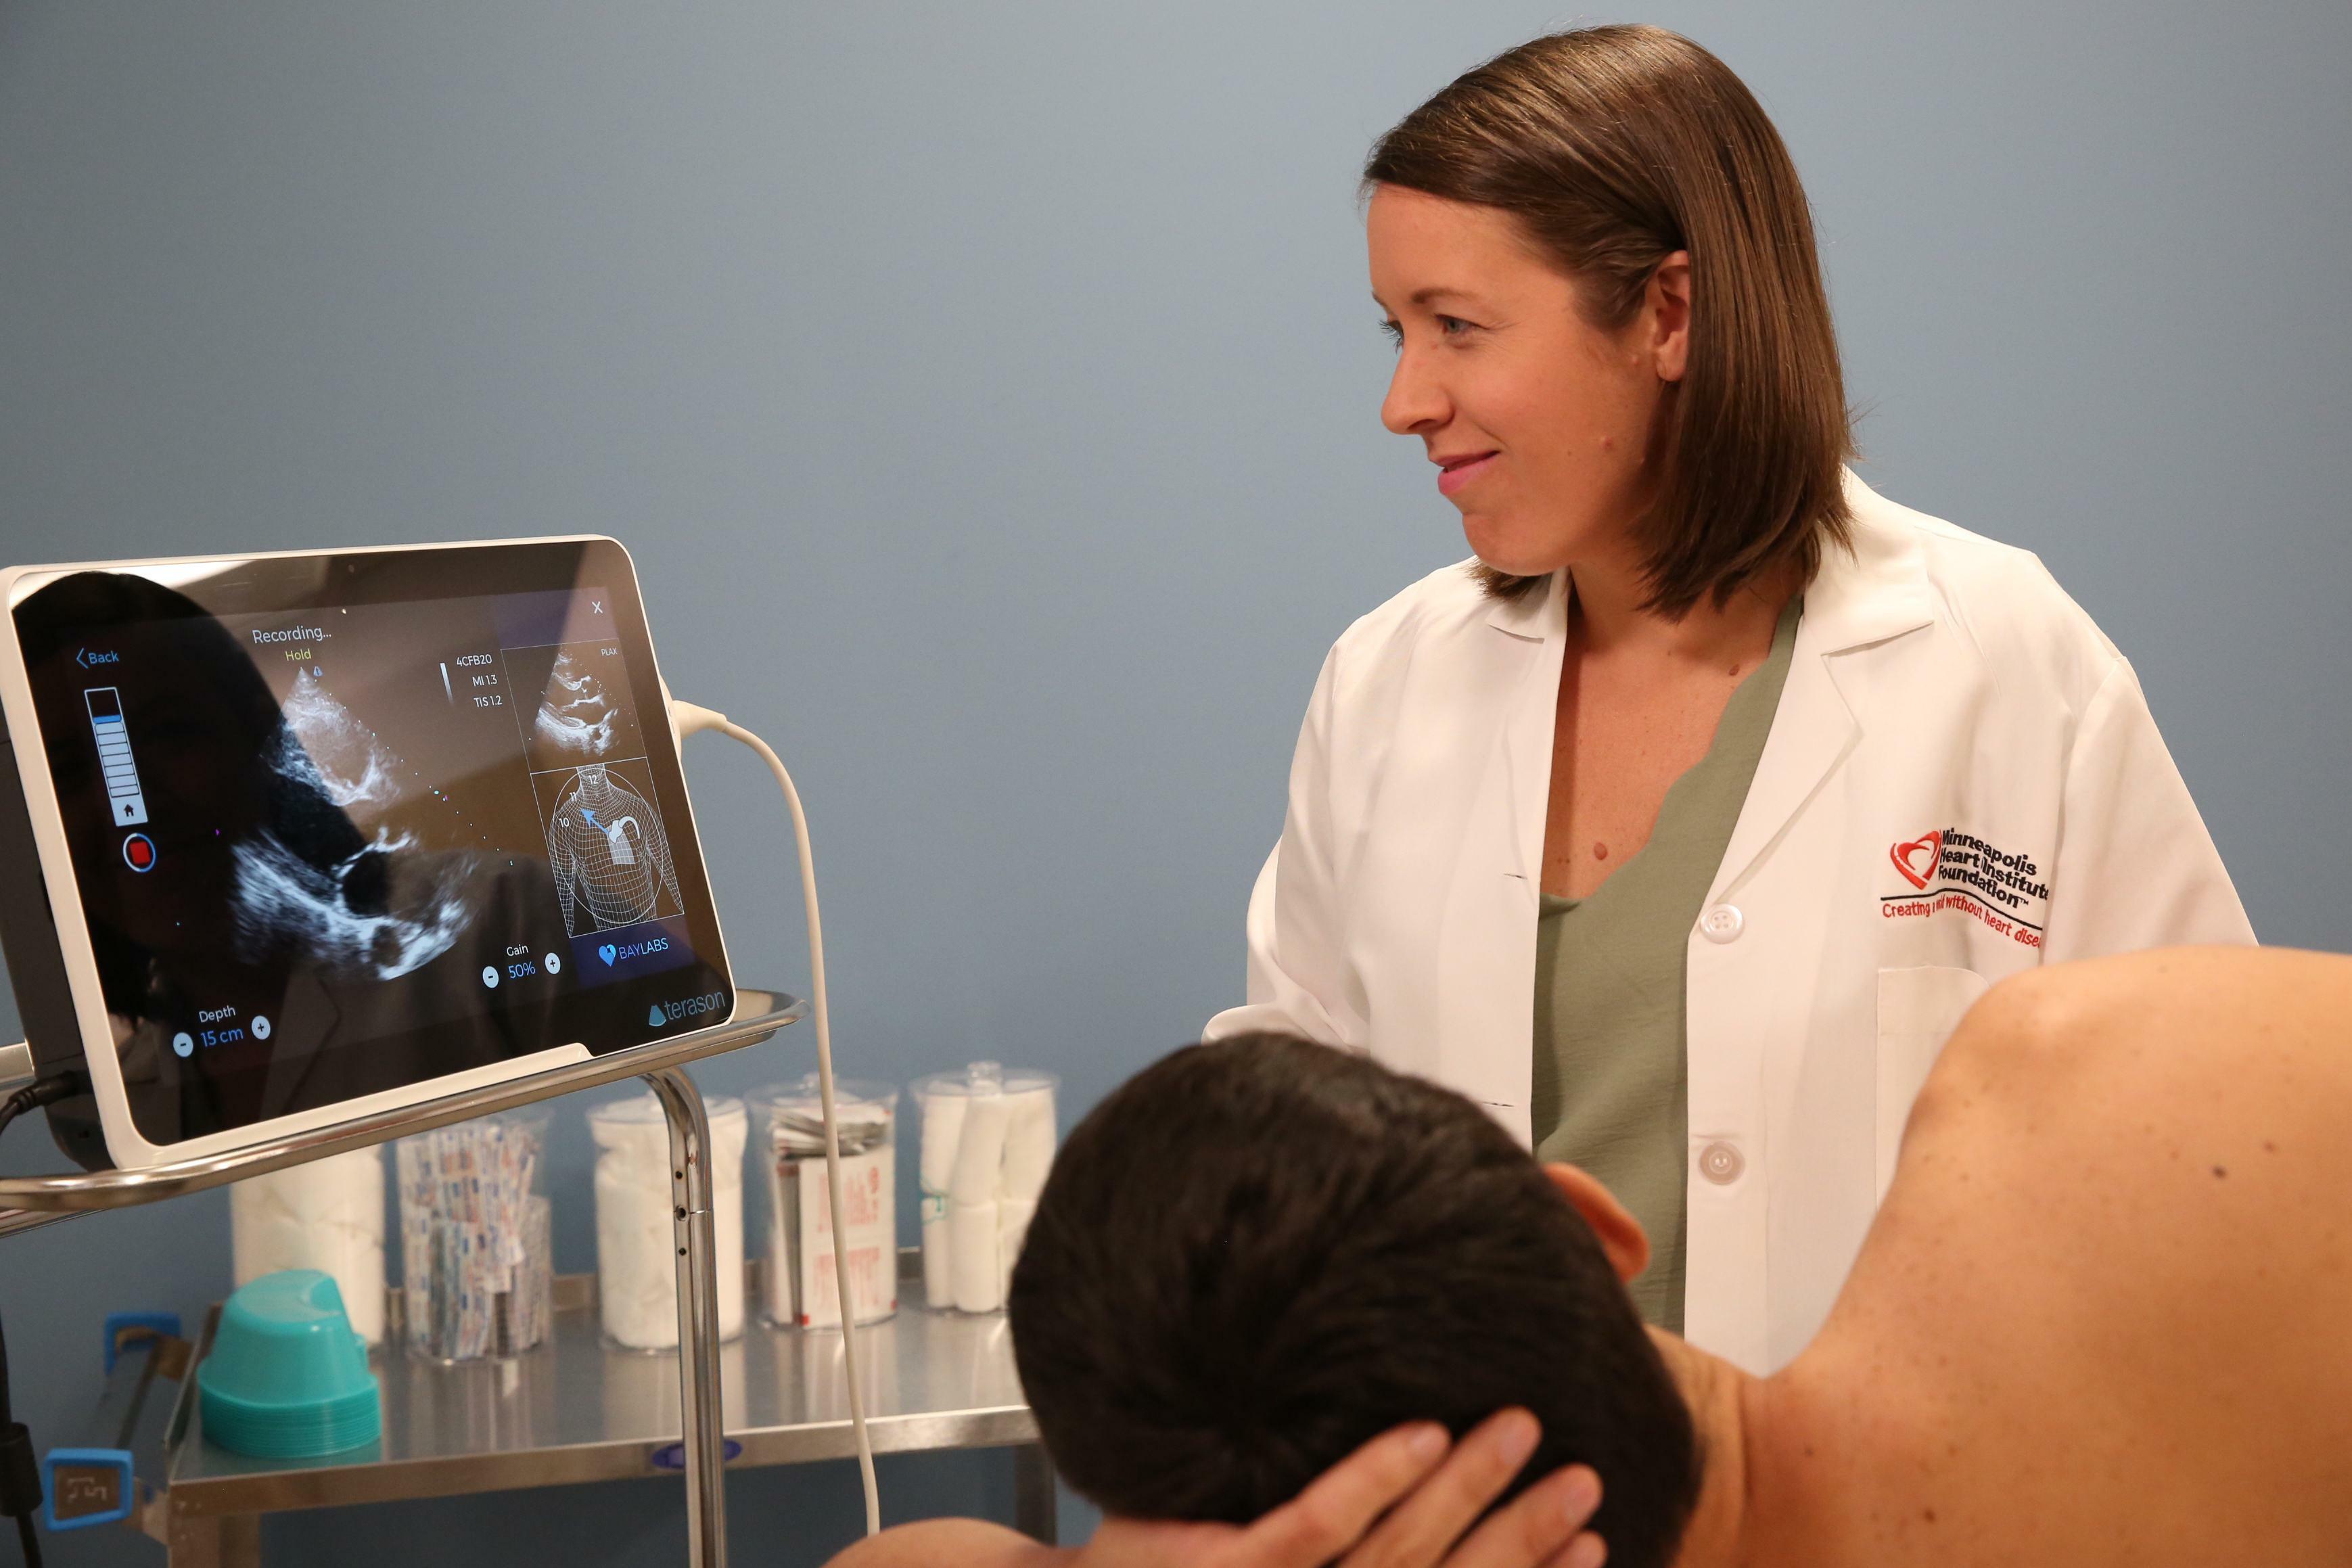 Medizin: Wenn KI beim Herz-Ultraschall hilft